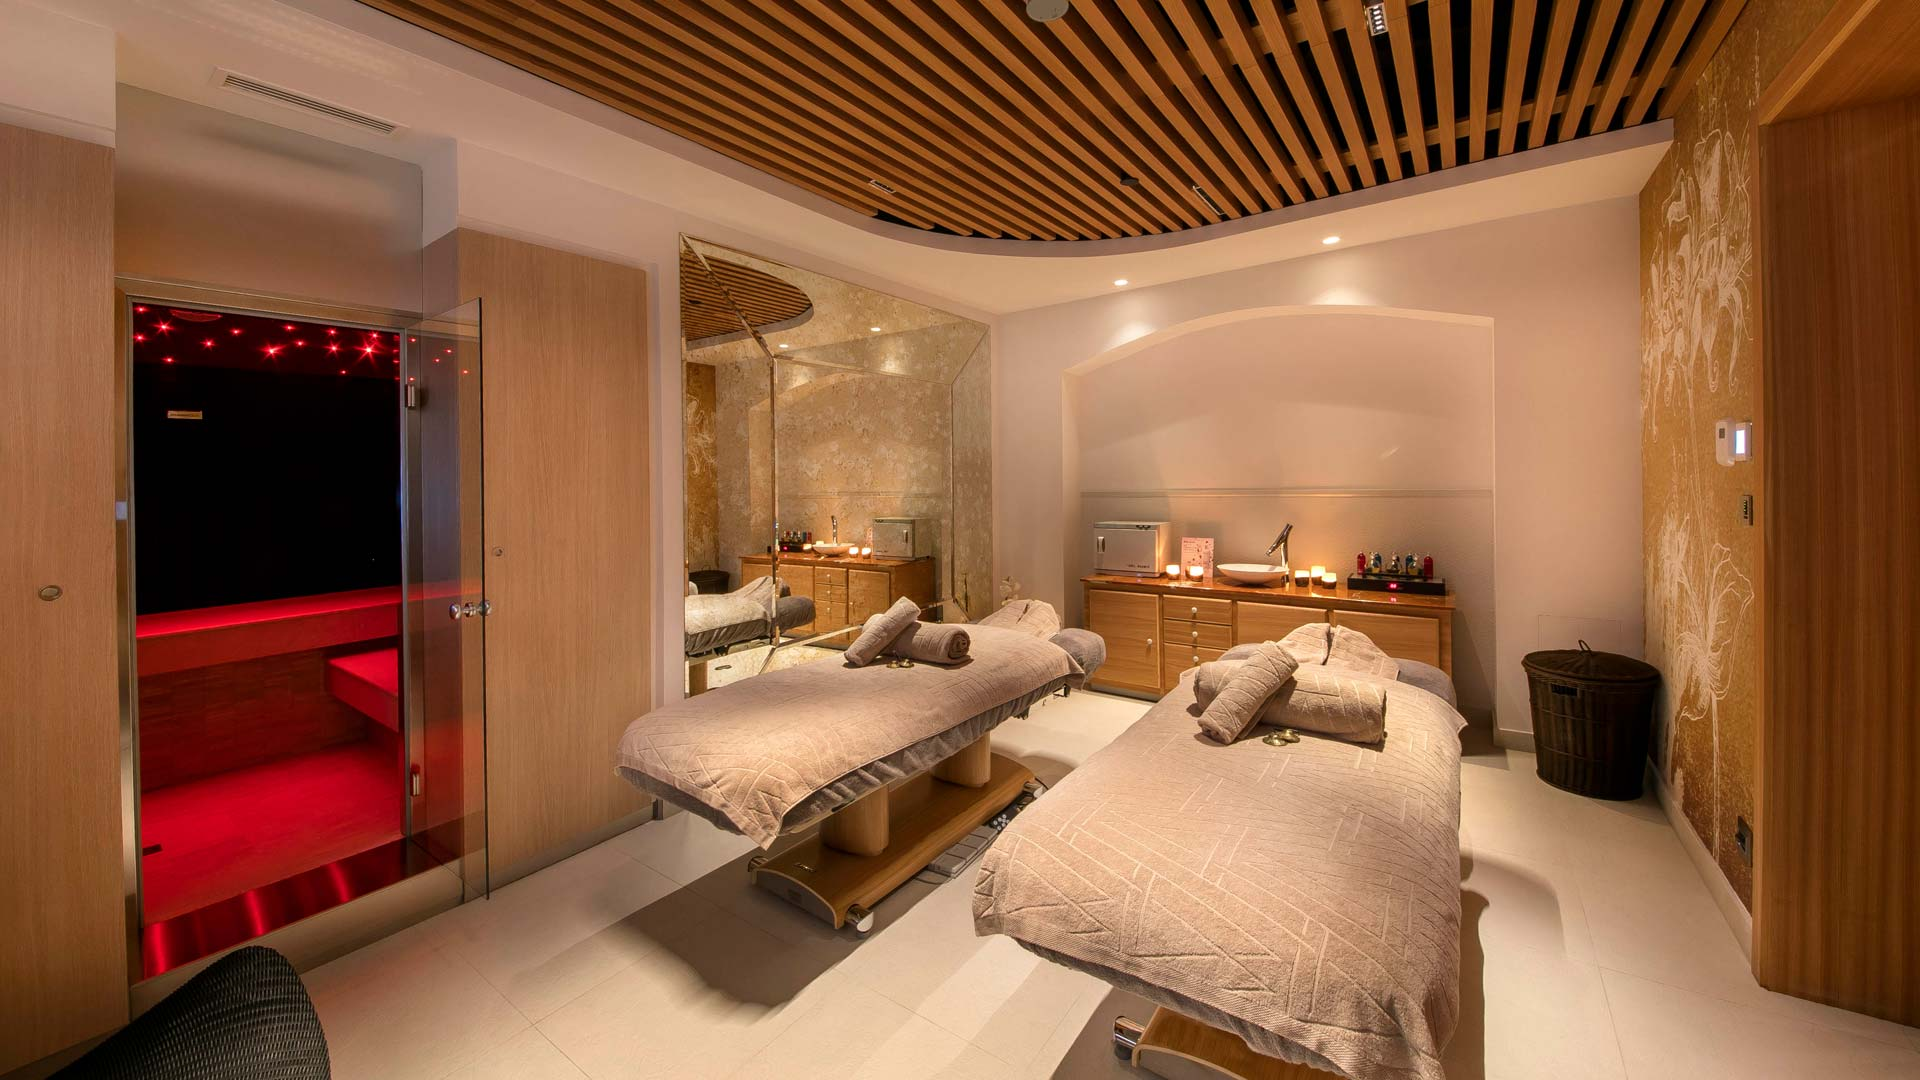 Fotografija hotelske sobe za masažu